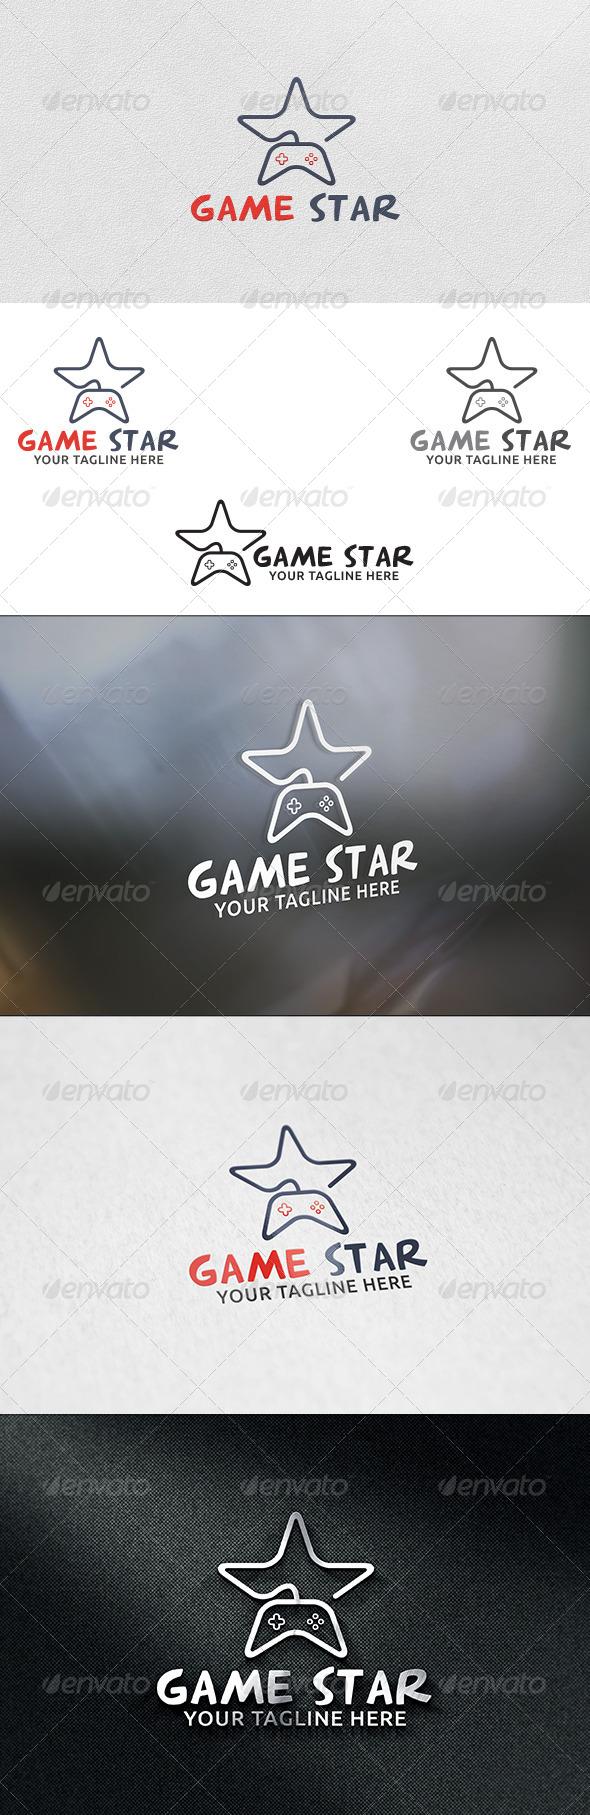 Game Star - Logo Template - Symbols Logo Templates